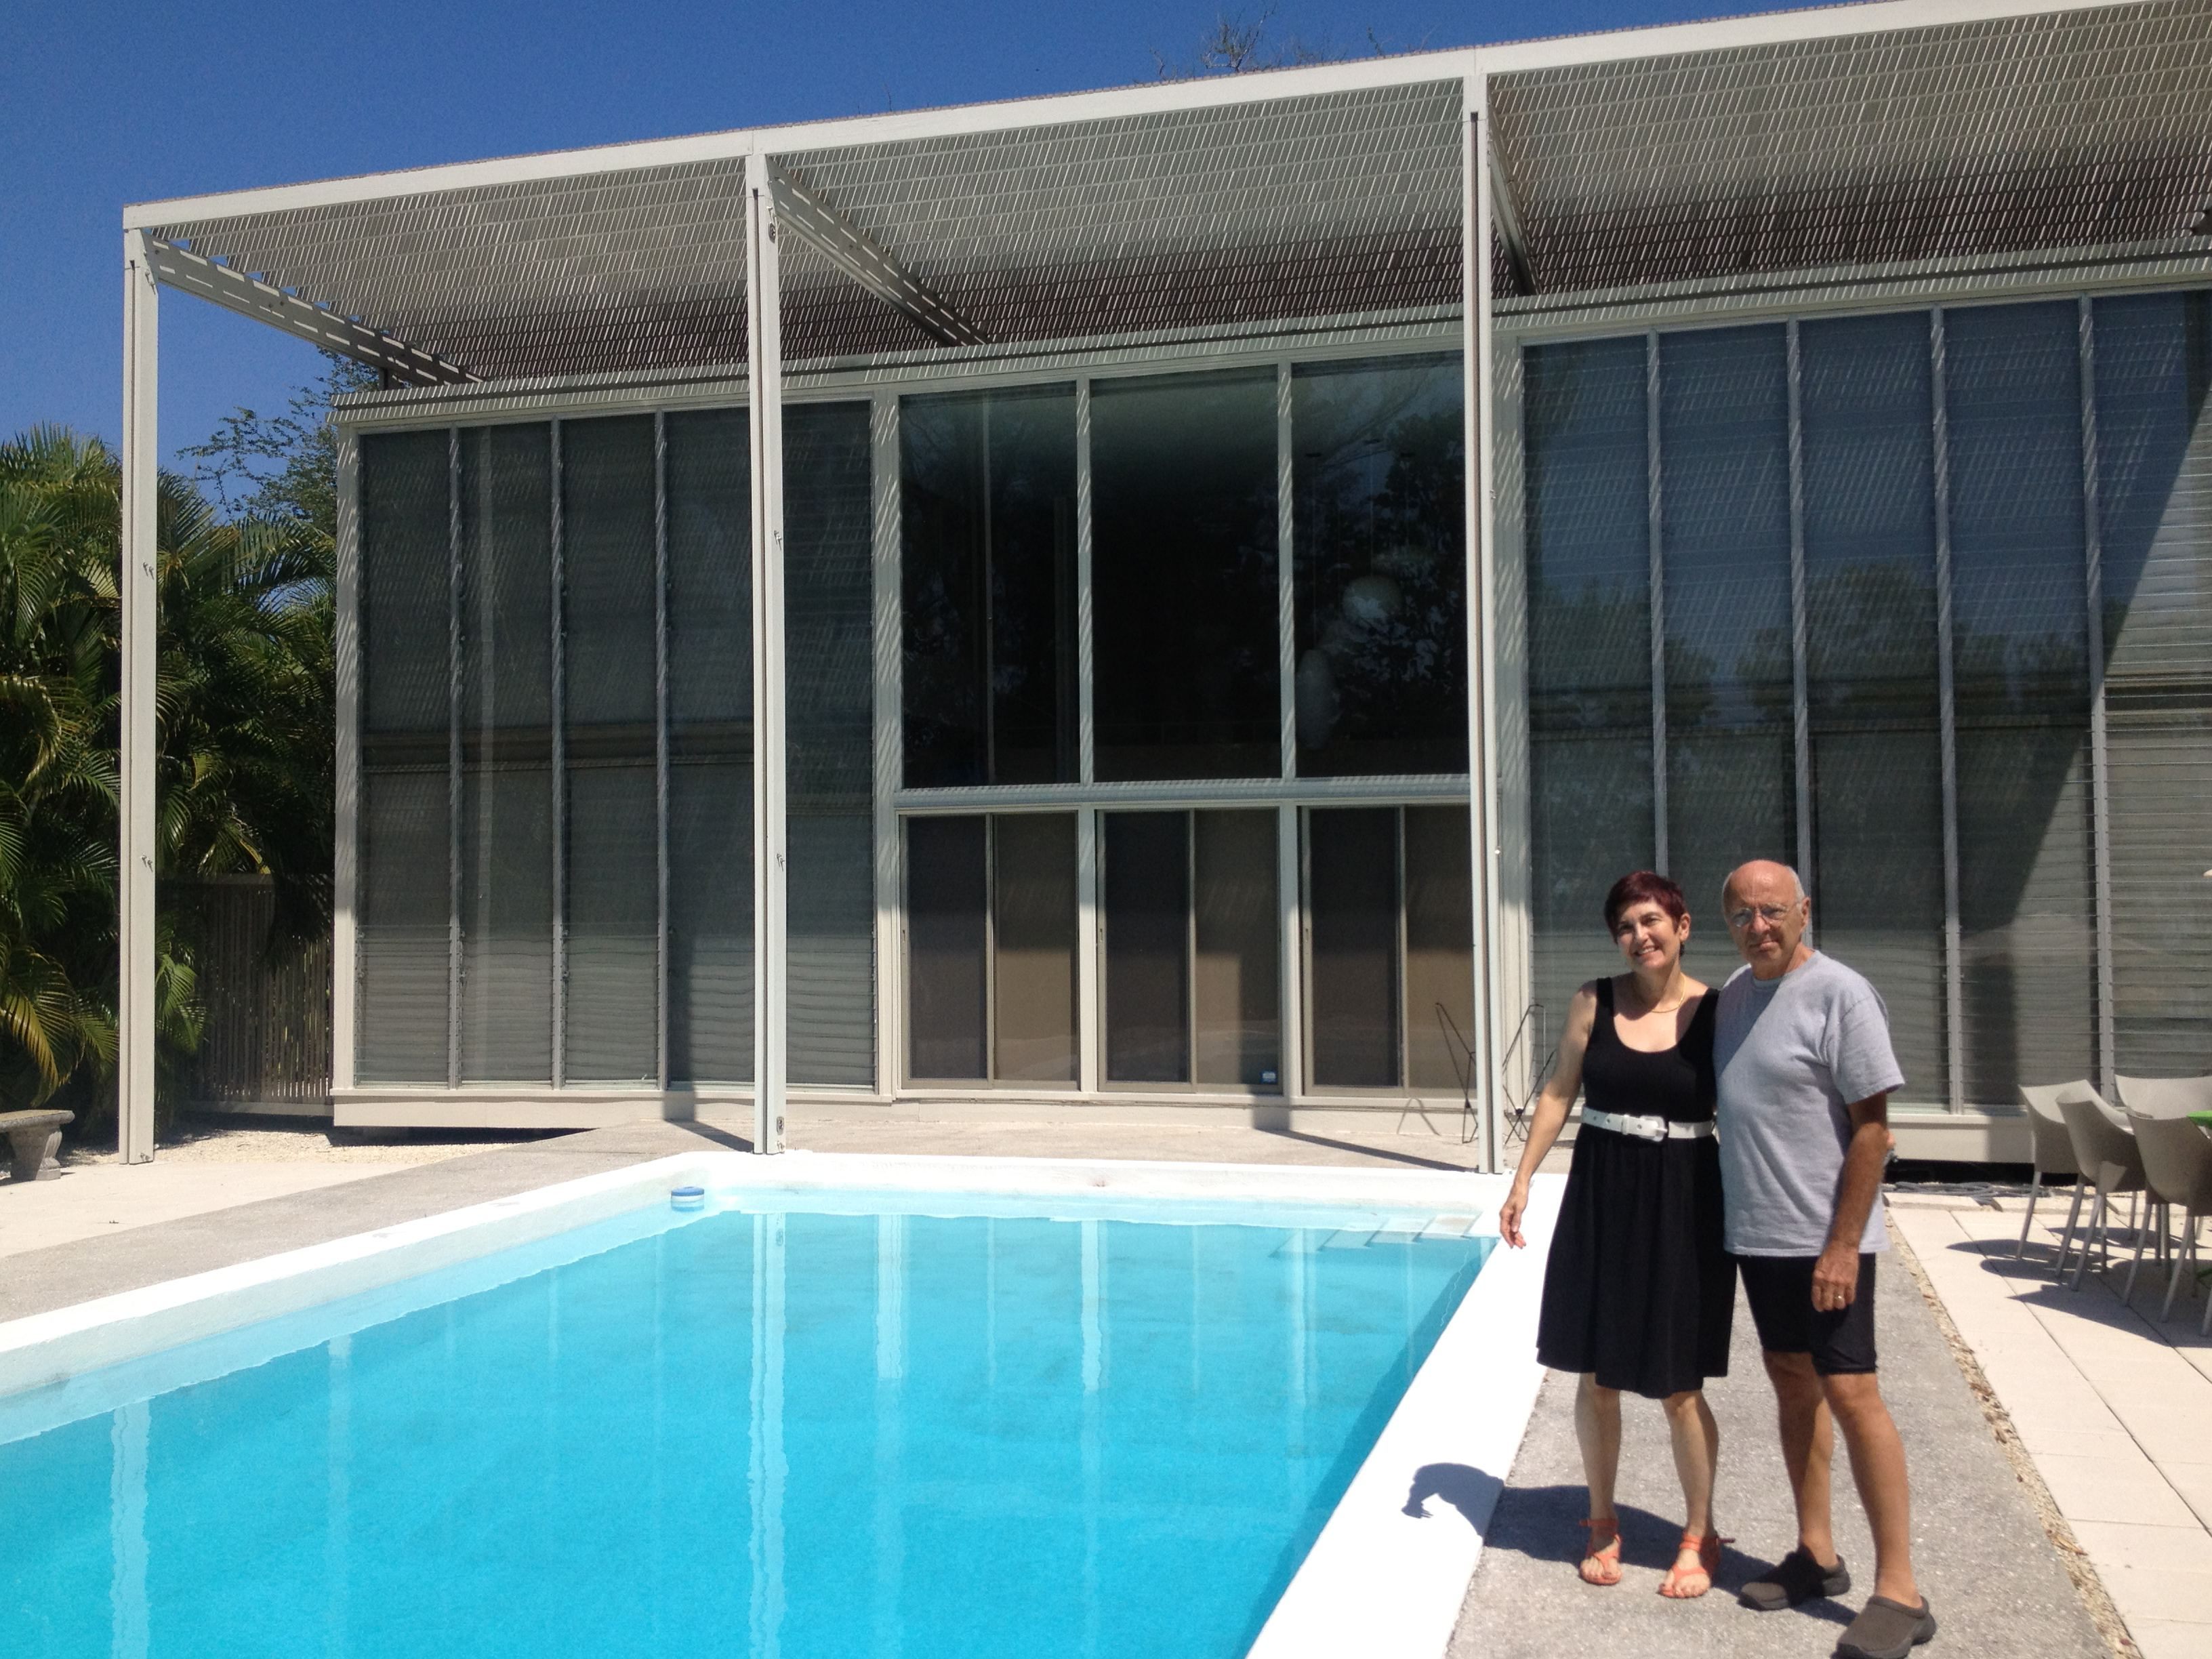 Architect Paul Rudolph's internationally acclaimed Umbrella House